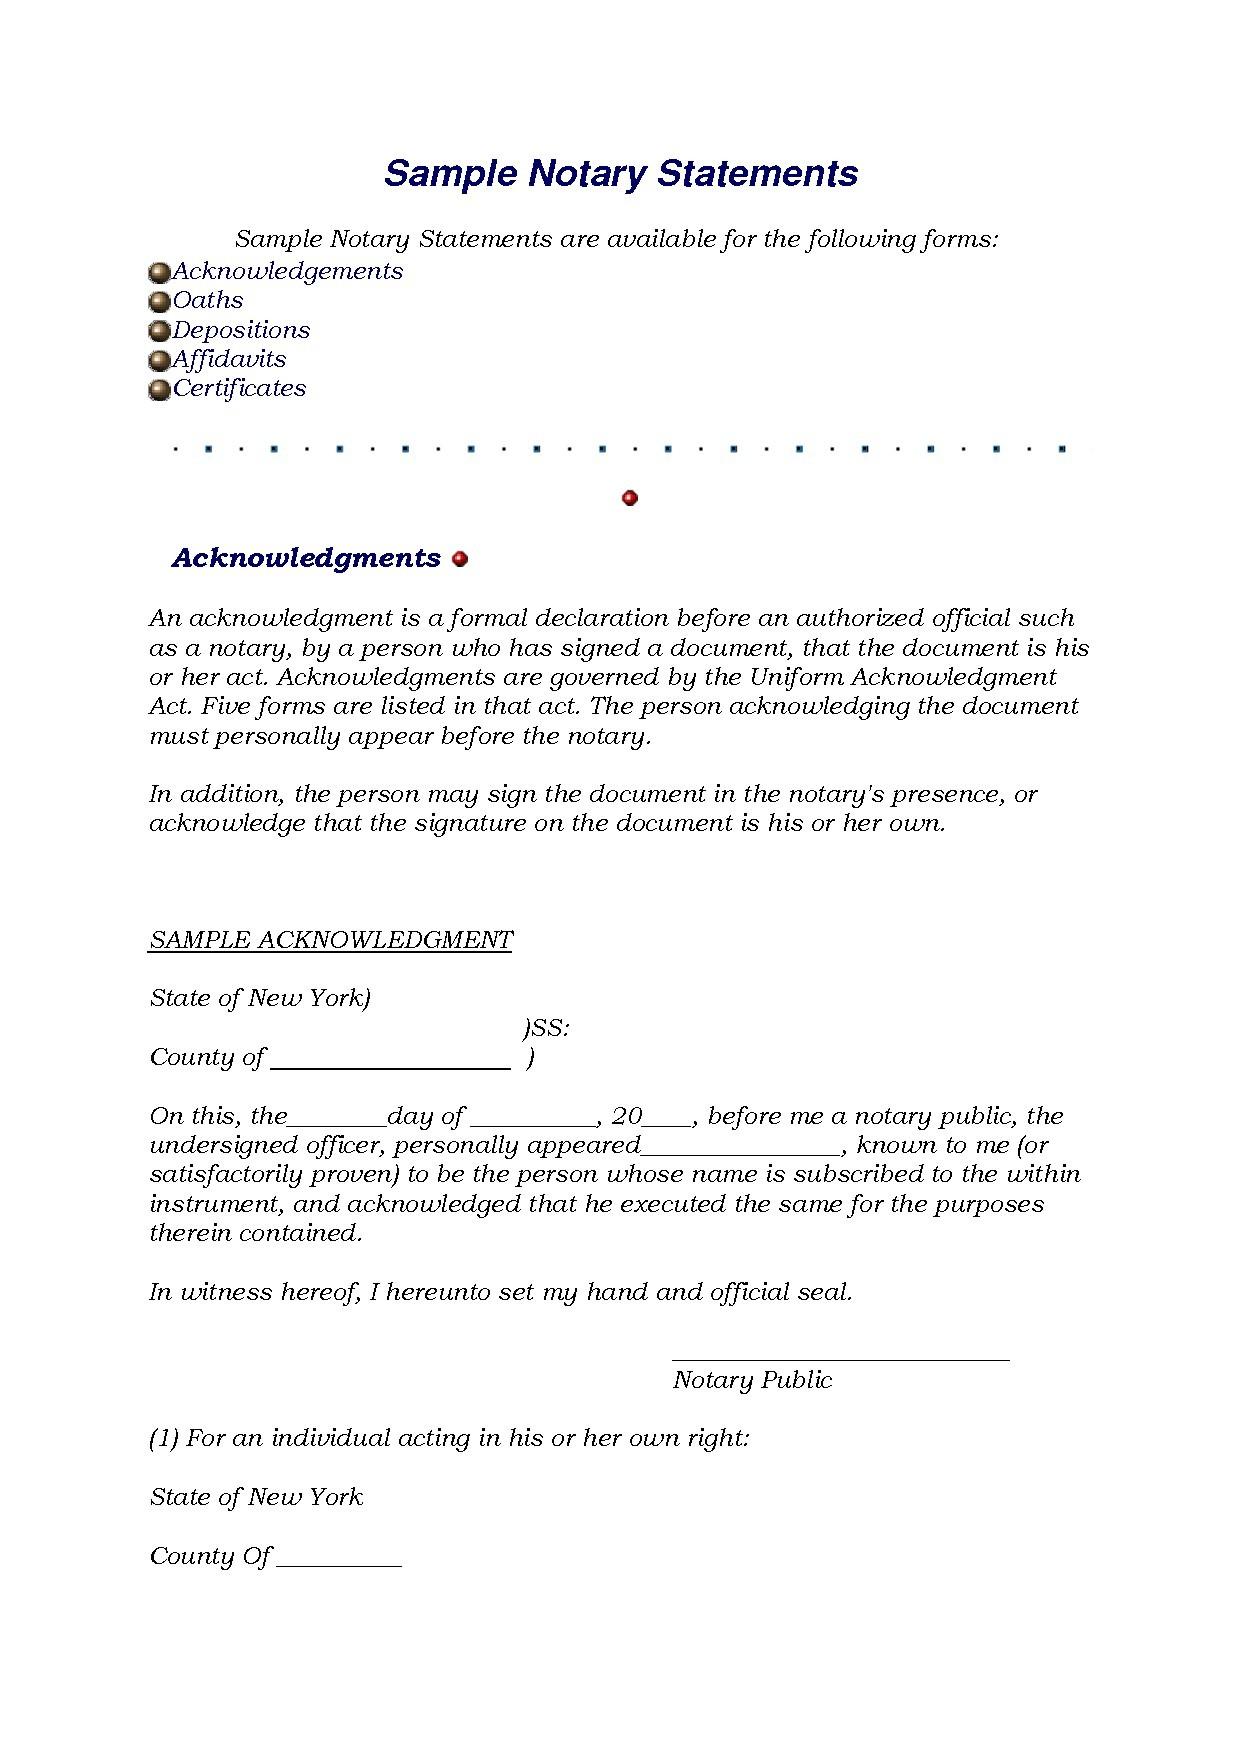 Notary Public Forms Washington State | MBM Legal